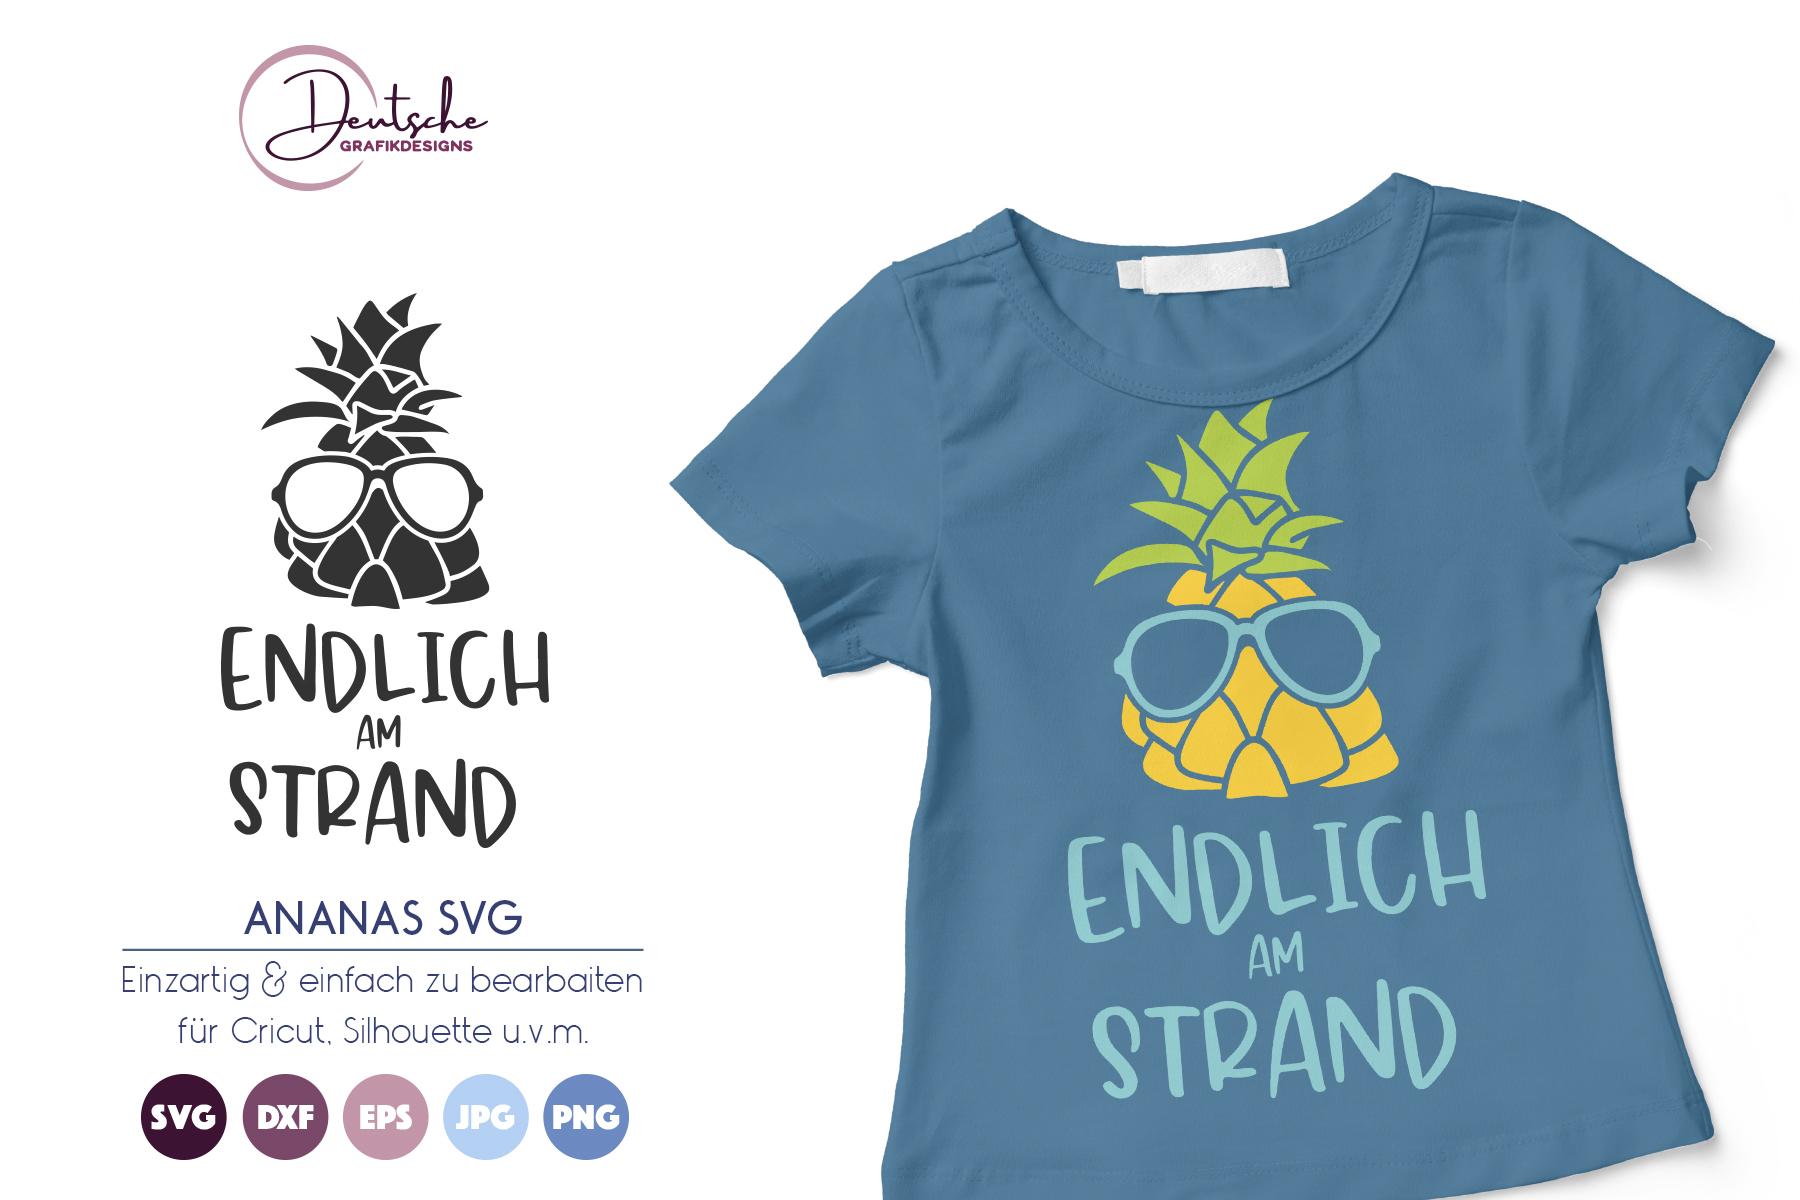 Endlich am Strand | Ananas SVG example image 1